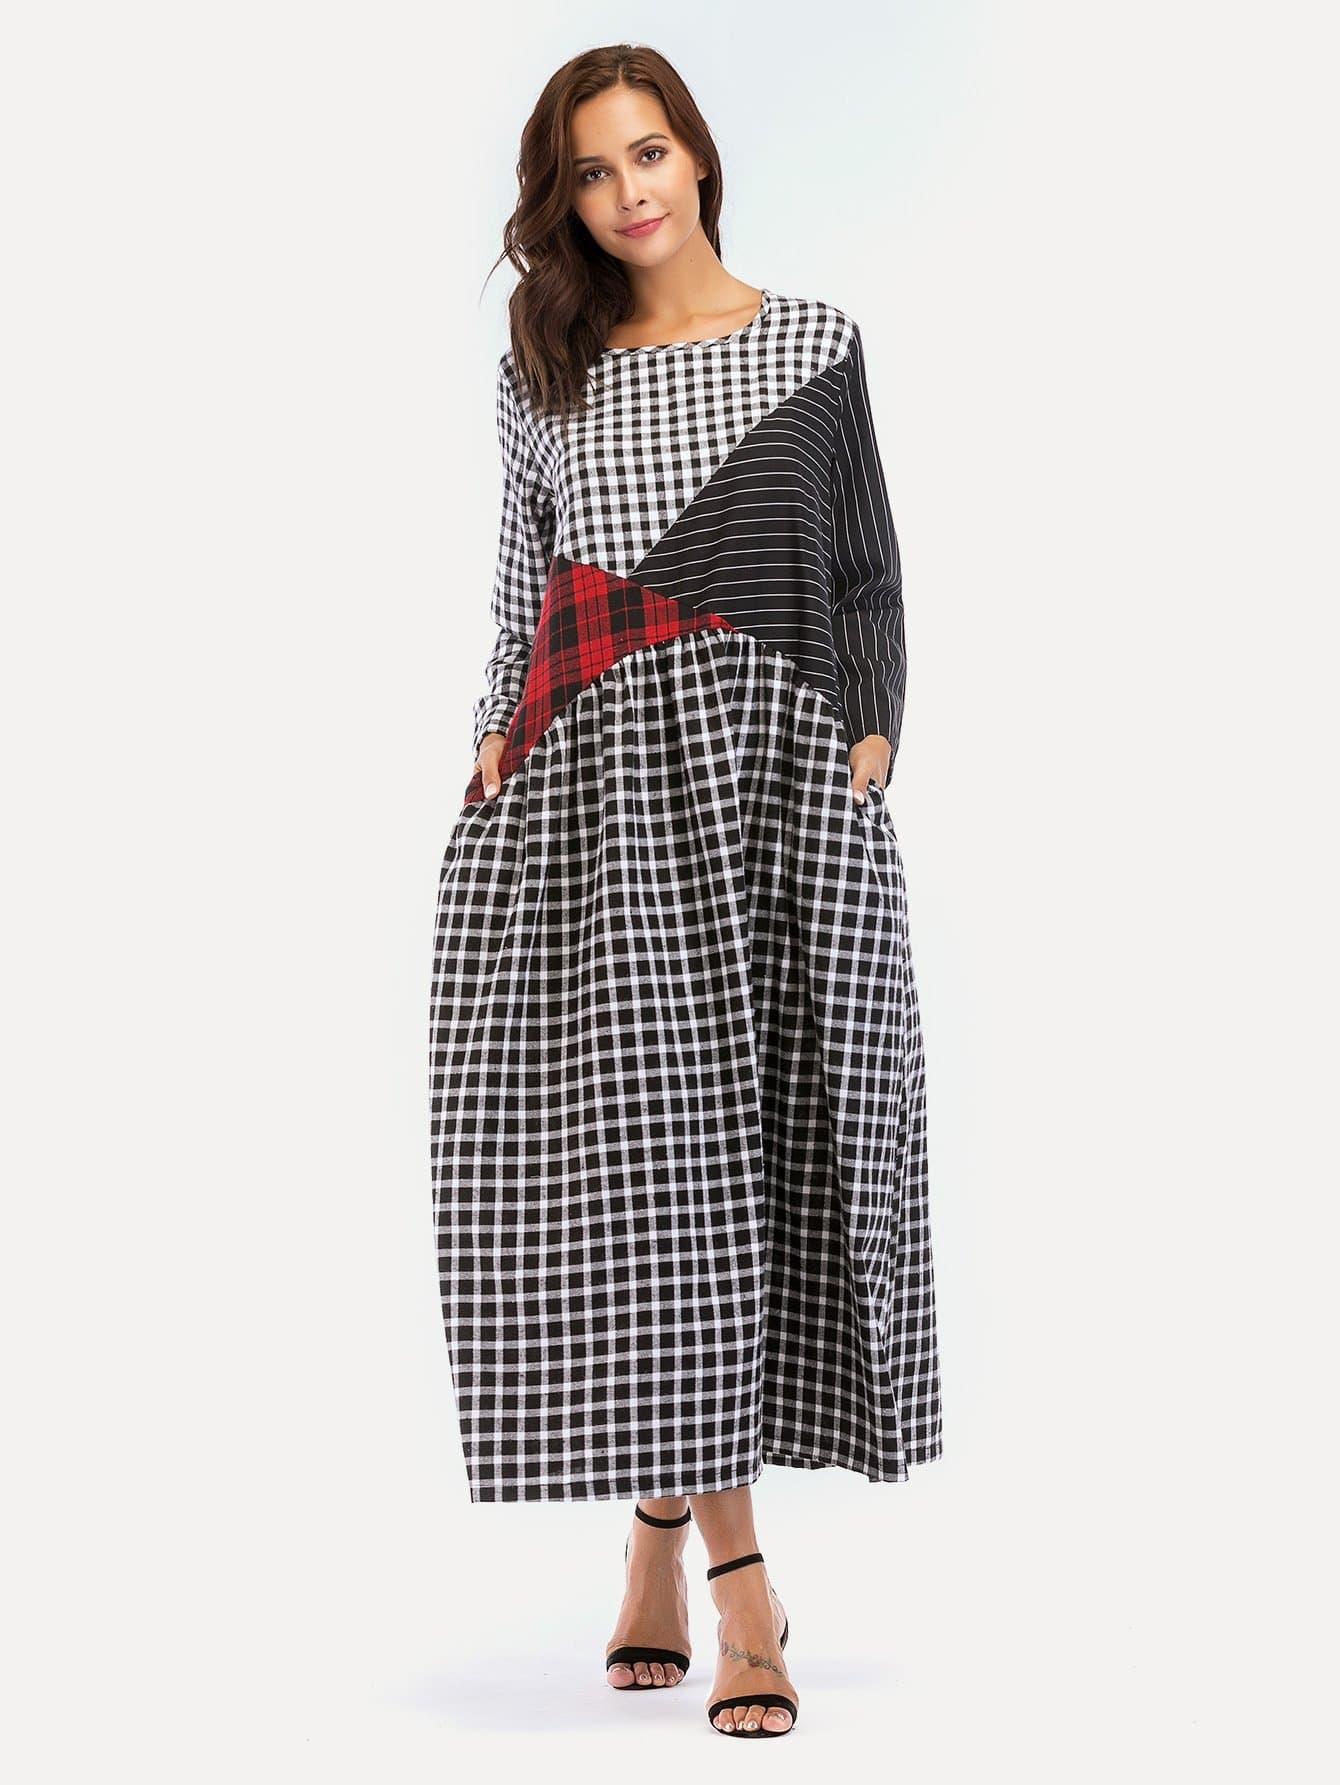 Stripe And Plaid Contrast Hidden Pocket Longline Dress hidden pocket striped dress